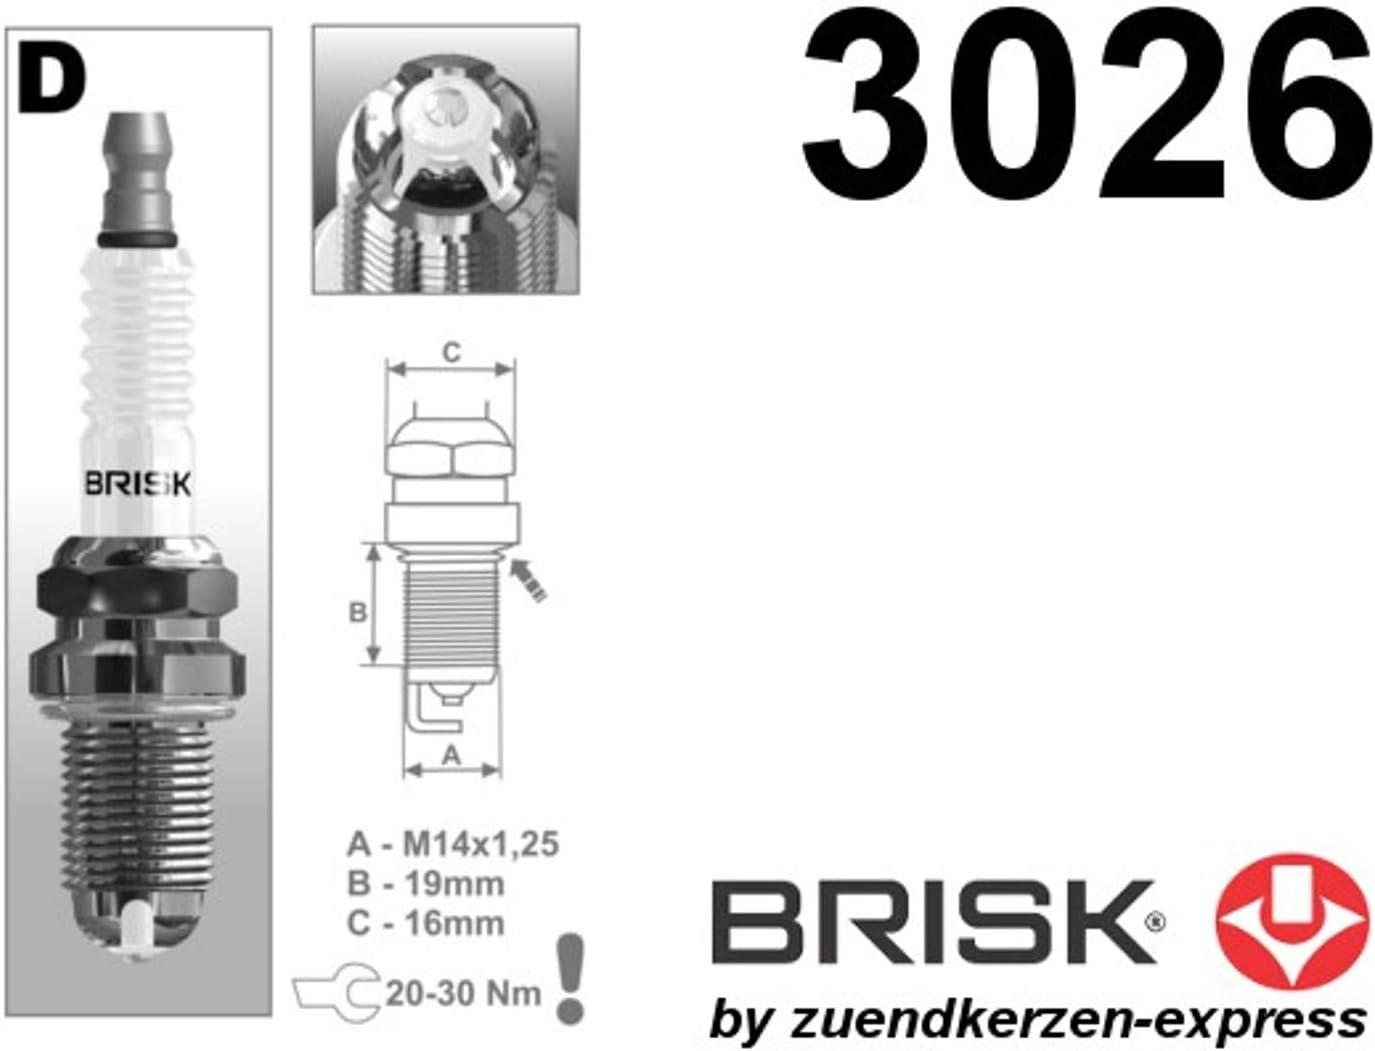 Brisk Premium Racing Dor15lgs 3026 Zündkerzen 6 Stück Auto